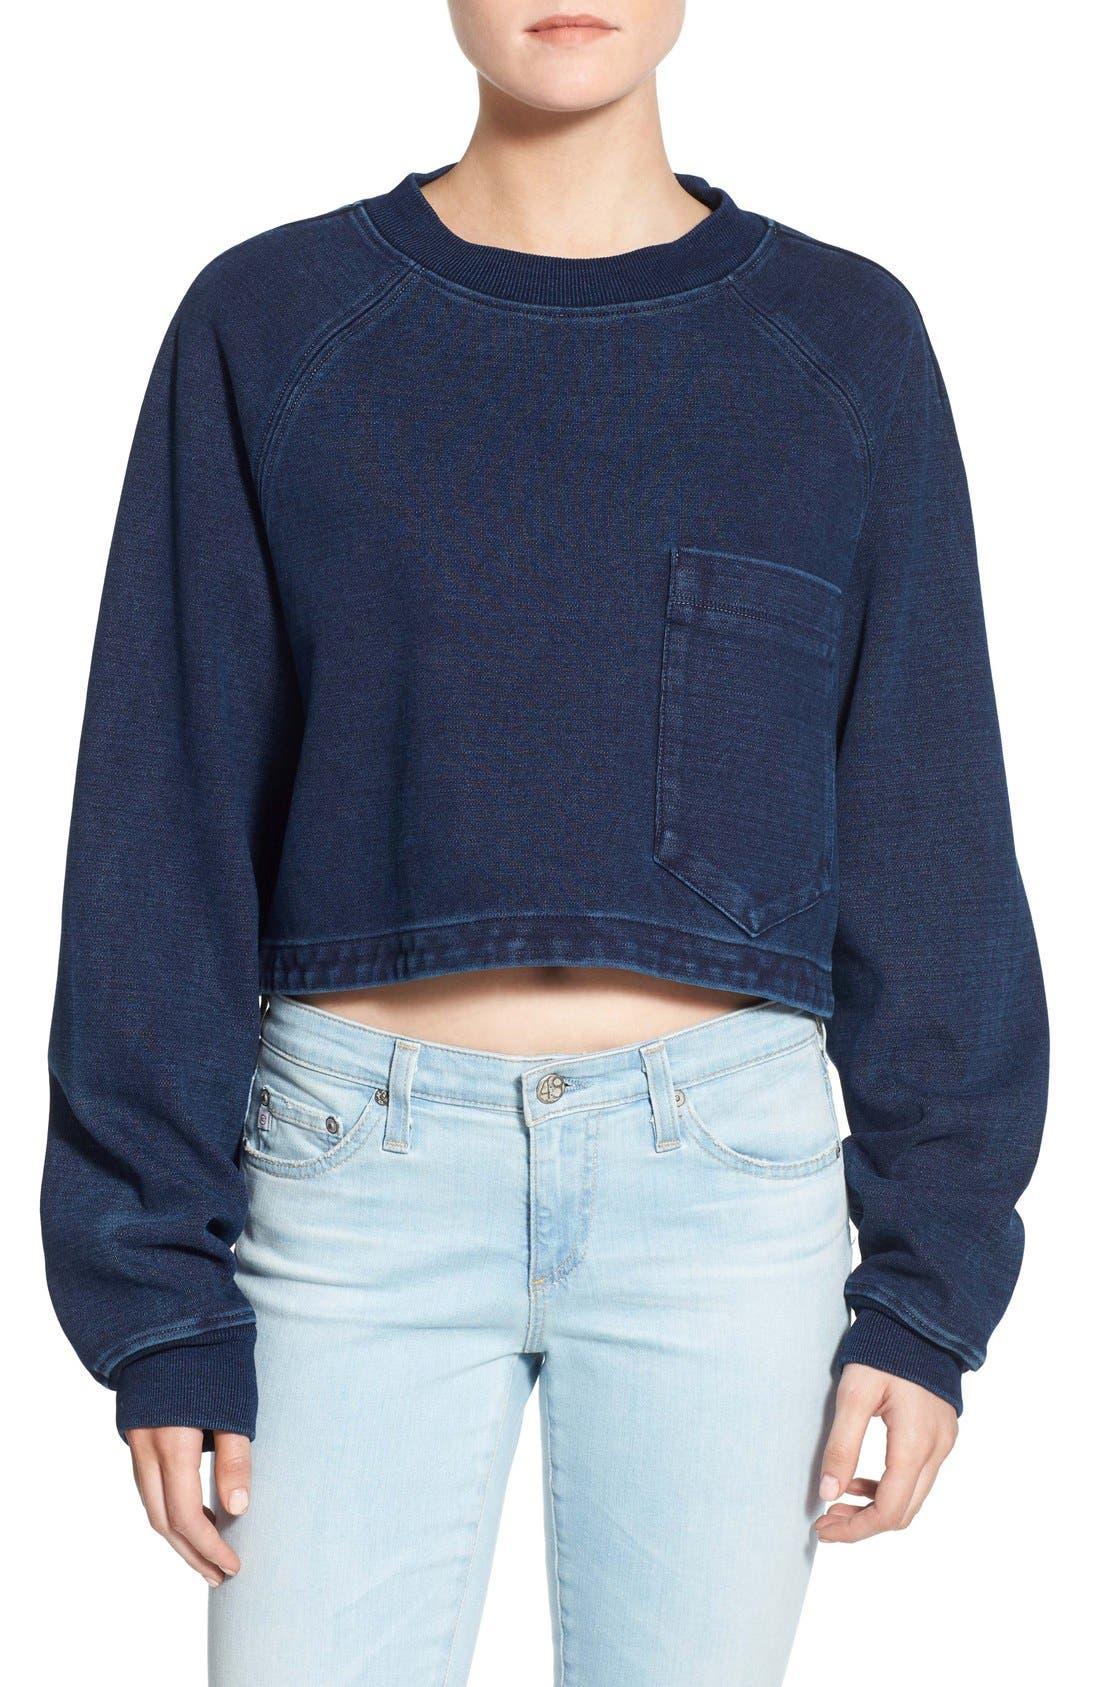 Main Image - AG Indigo Capsule Collection Cubo Crop Sweatshirt